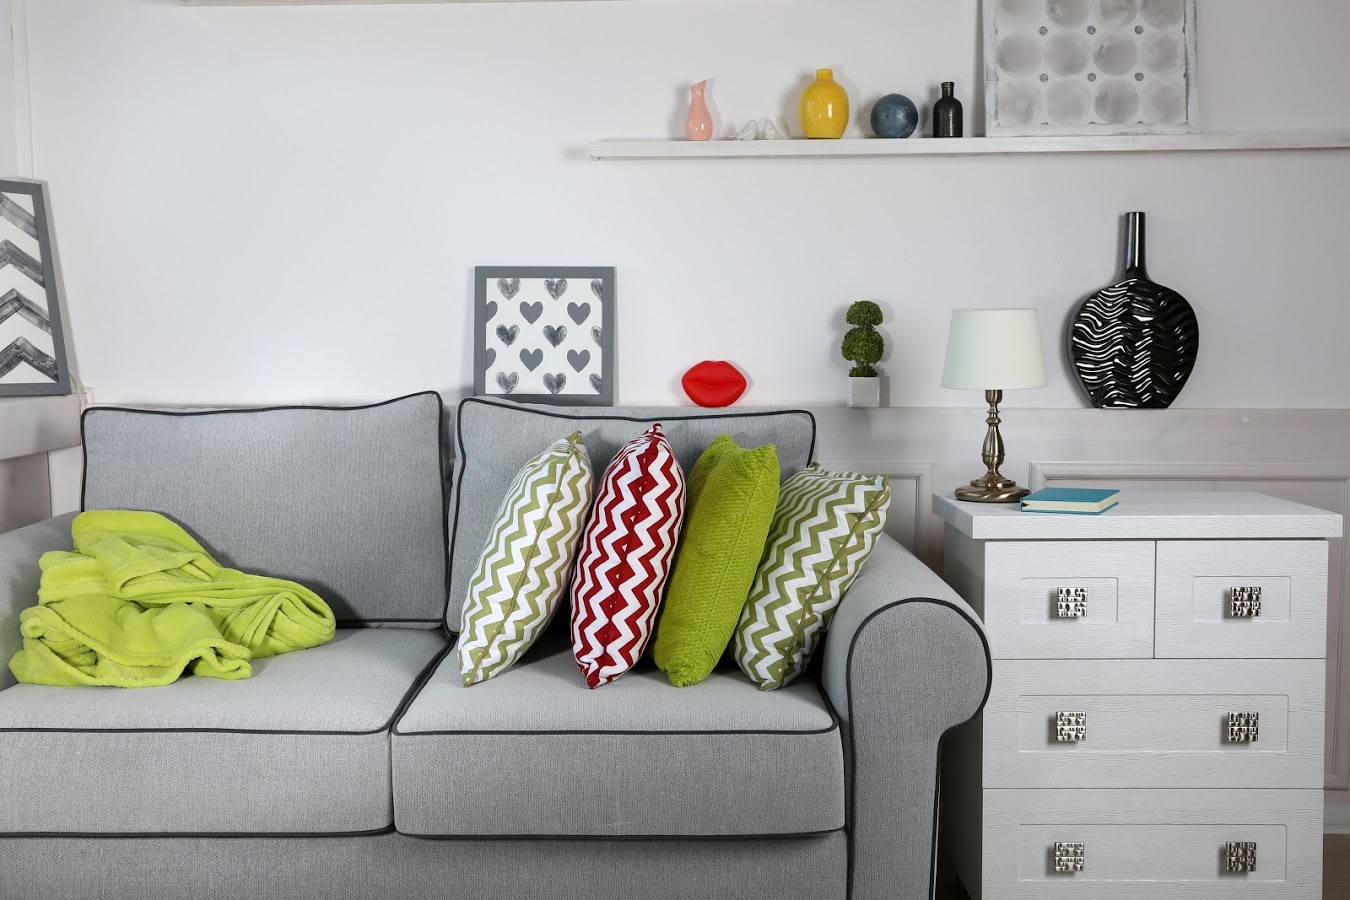 6 Tips for Storing Upholstered Furniture